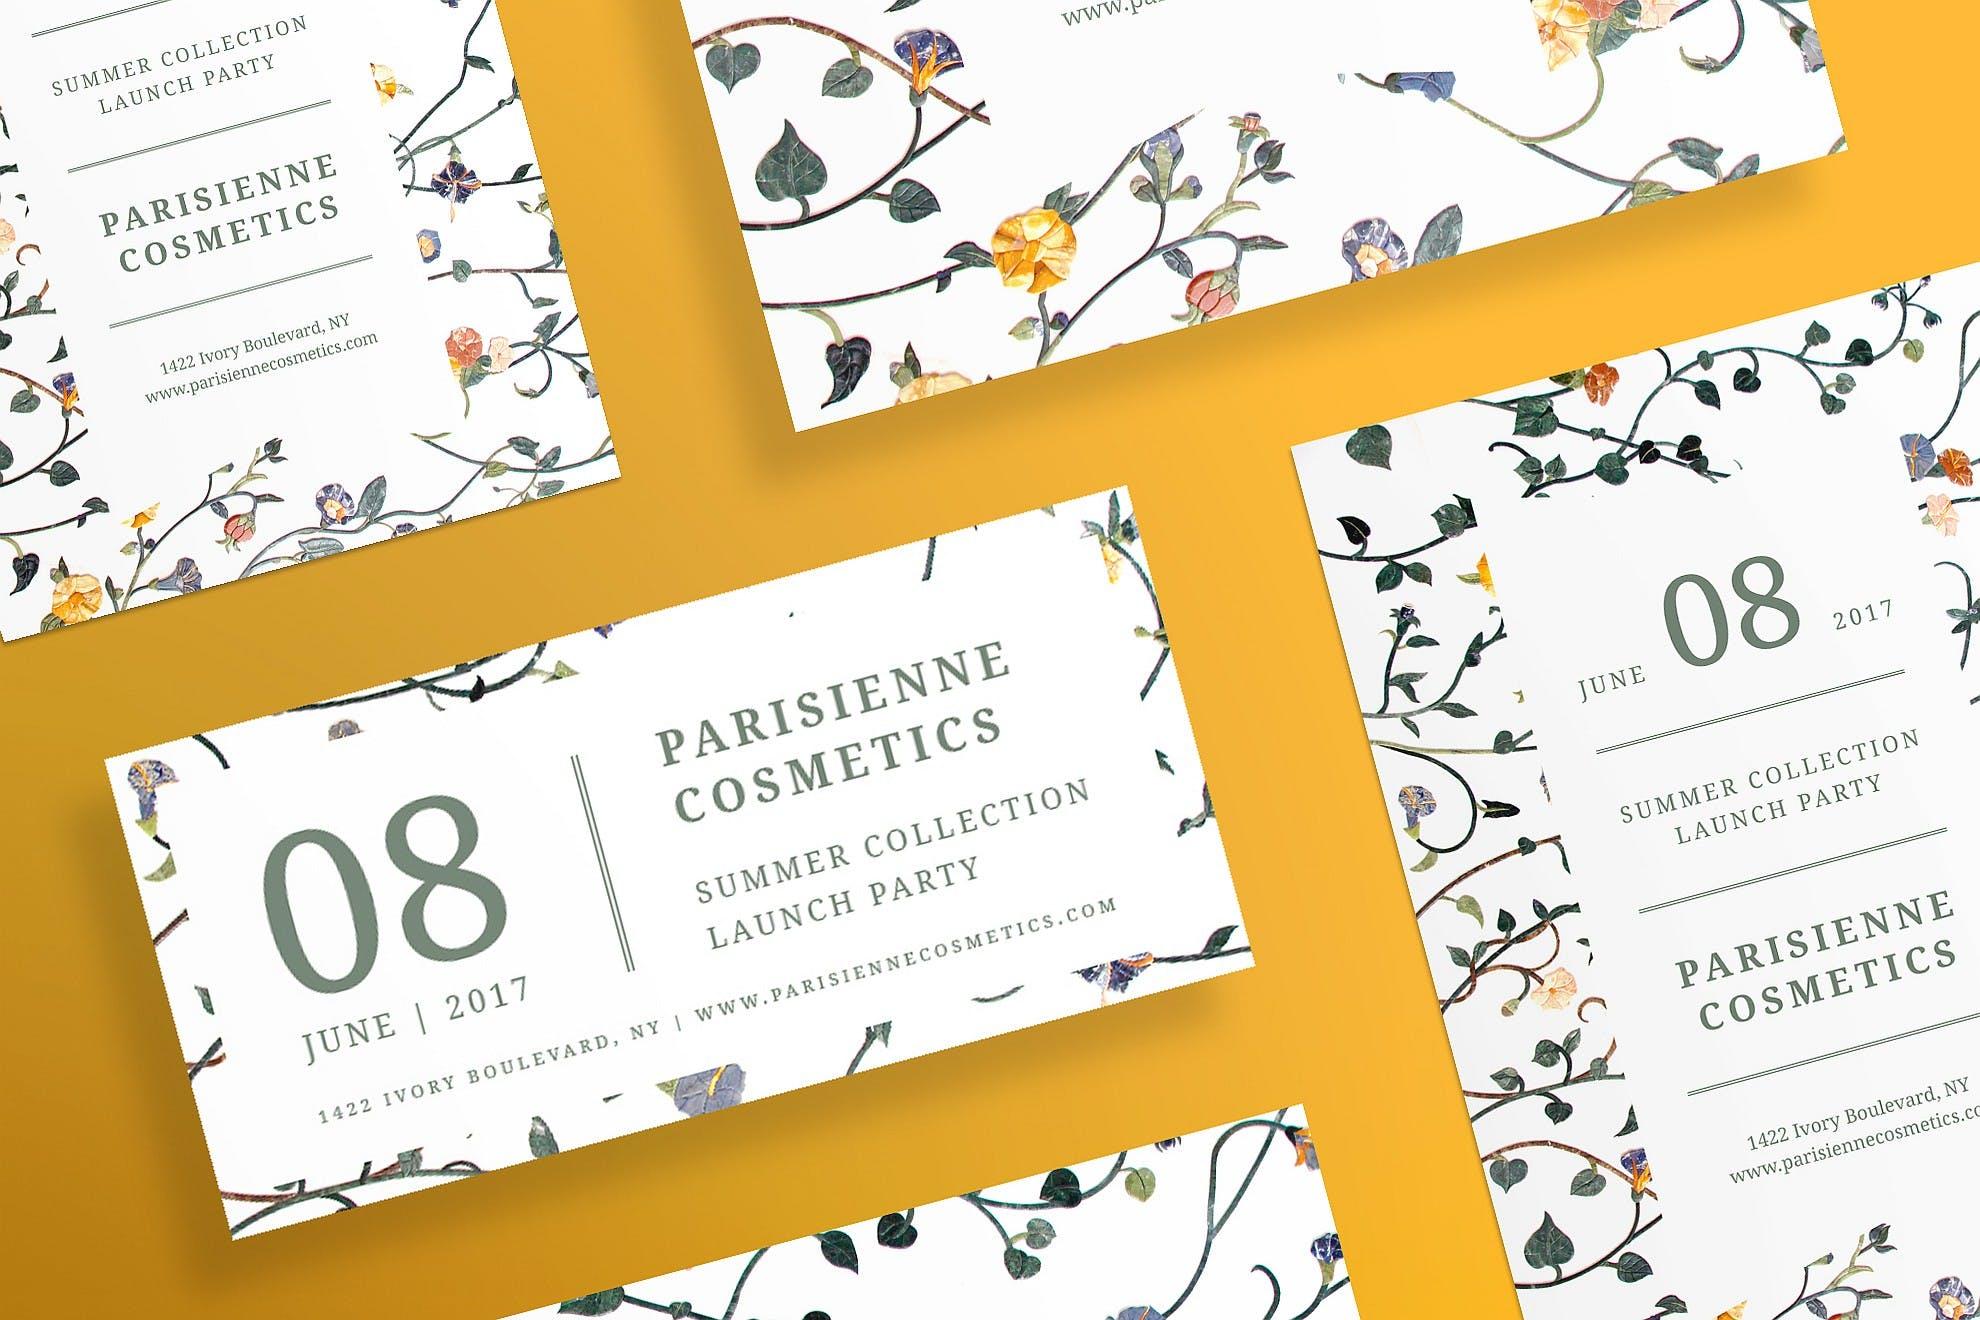 花卉植物素材模板展示素材Cosmetics Brand Flyer and Poster Template